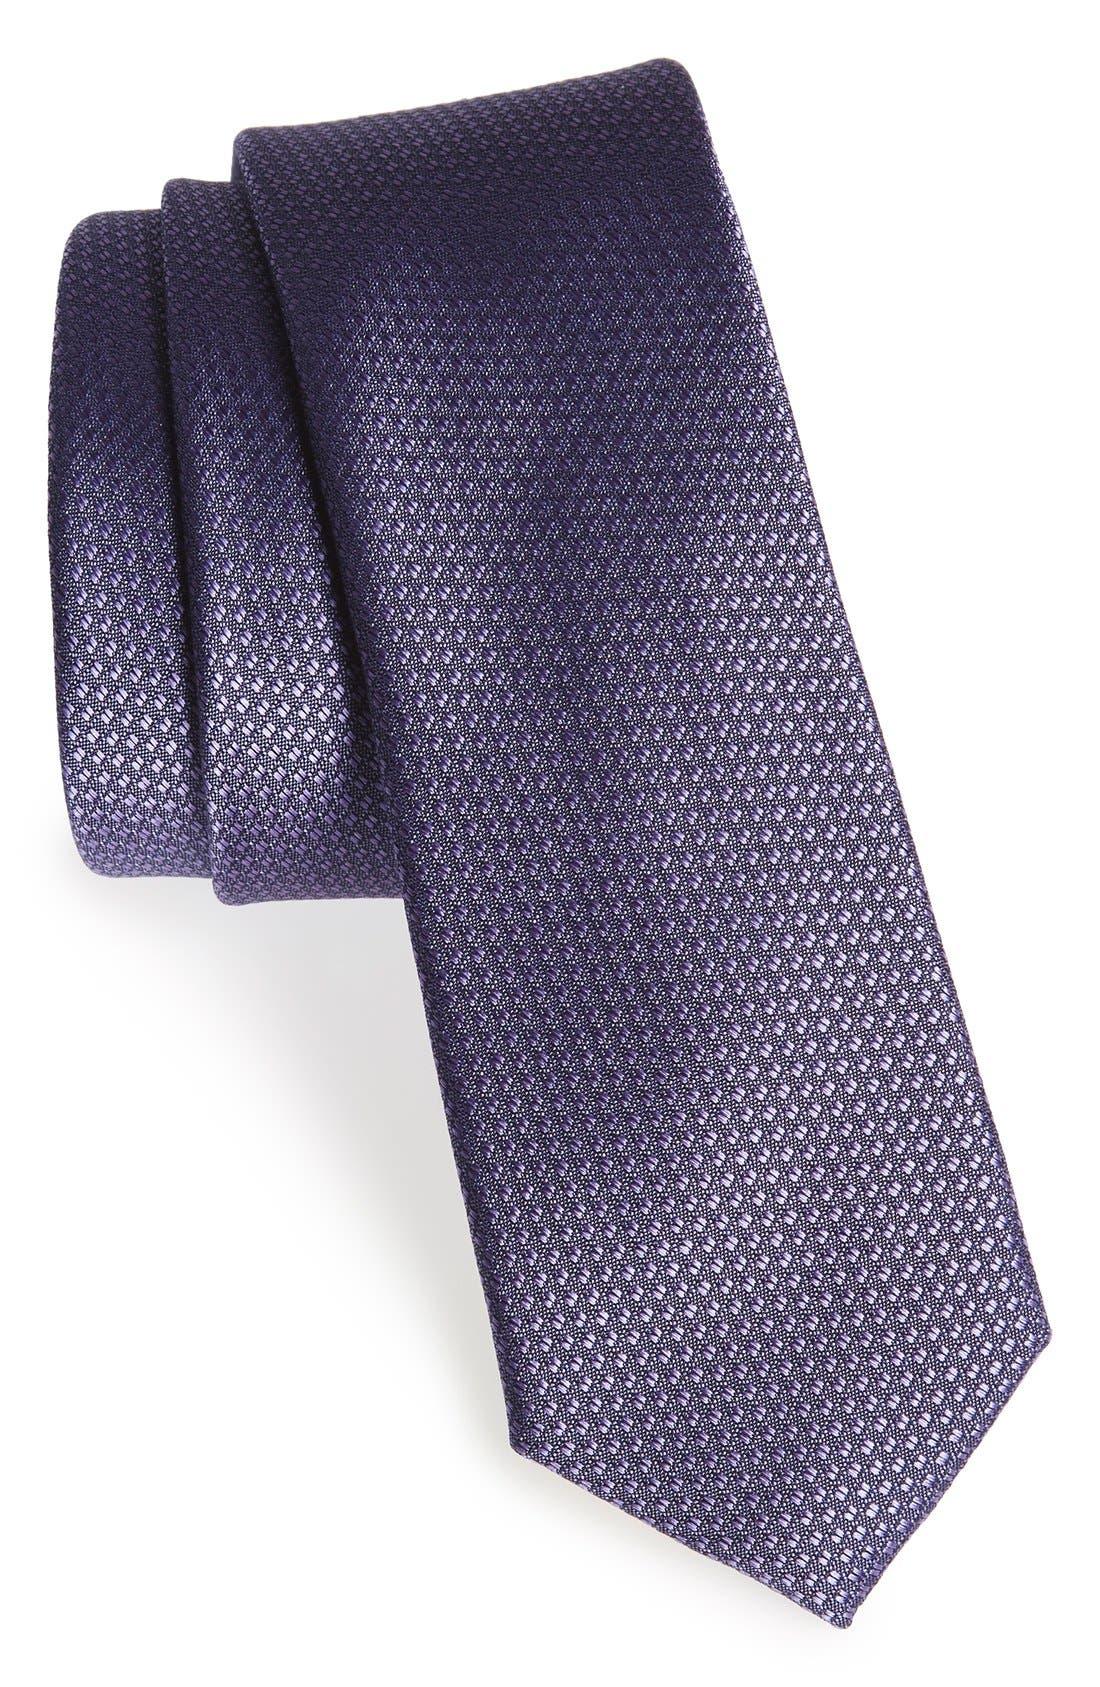 Seattle Textured Silk Tie,                             Main thumbnail 31, color,